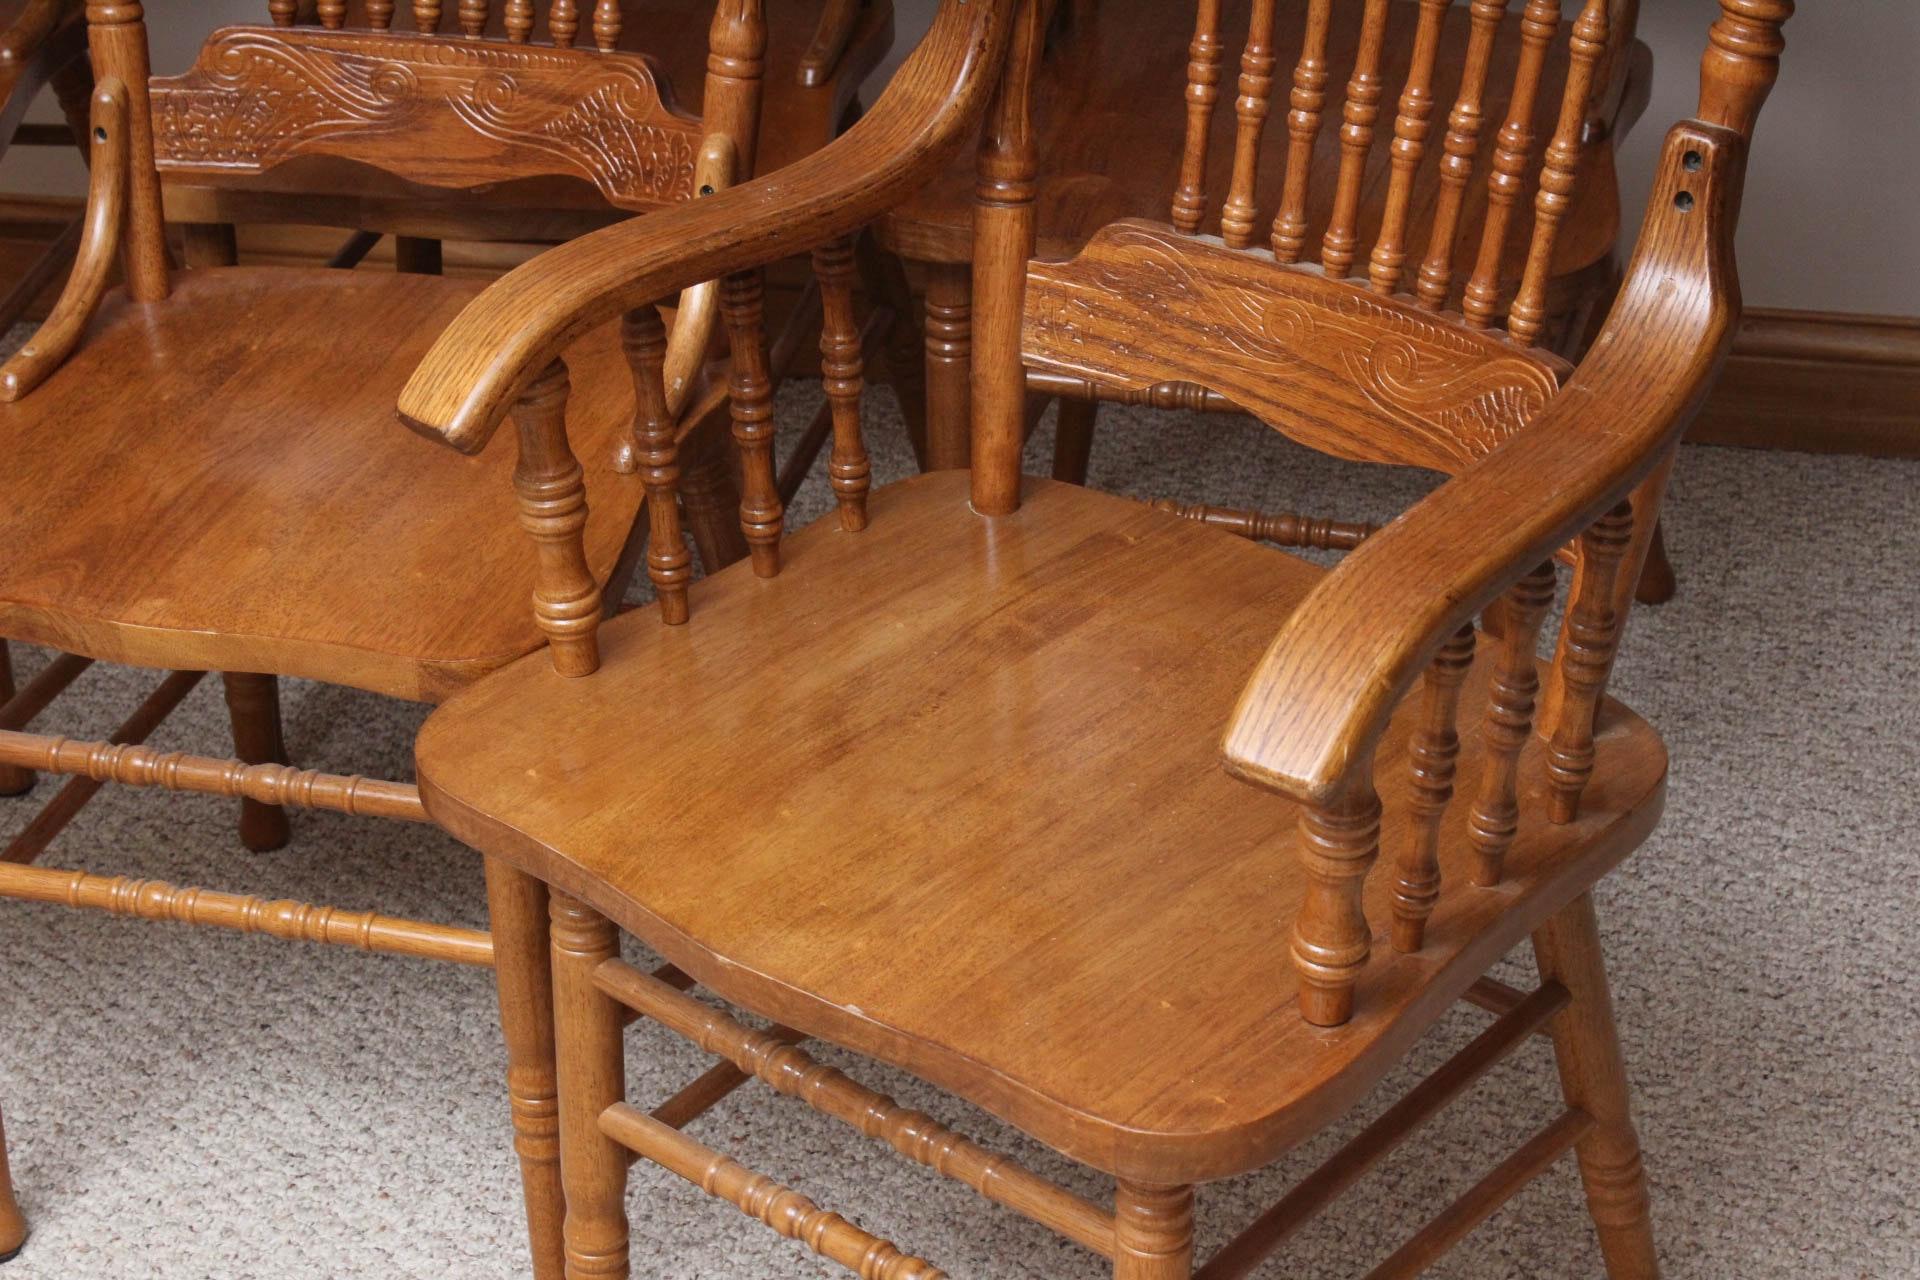 Six Vintage Oak Dining Room Chairs EBTH : IMG6539jpgixlibrb 11 from www.ebth.com size 1400 x 933 jpeg 305kB